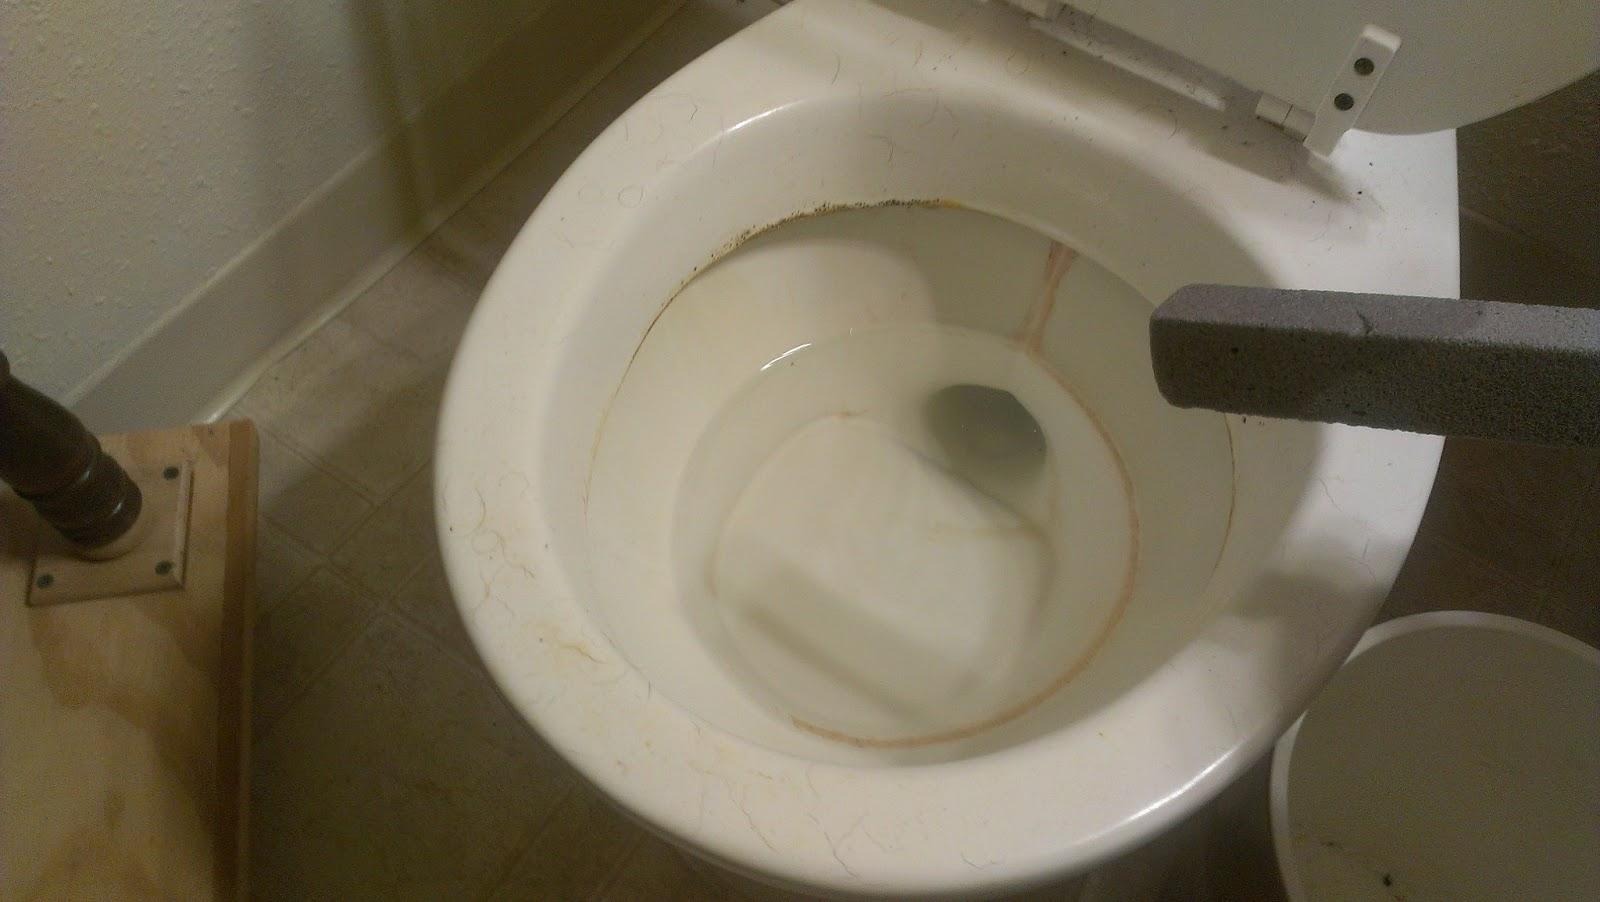 Daily Vitamin B Scrub Out Toilet Bowl Stains